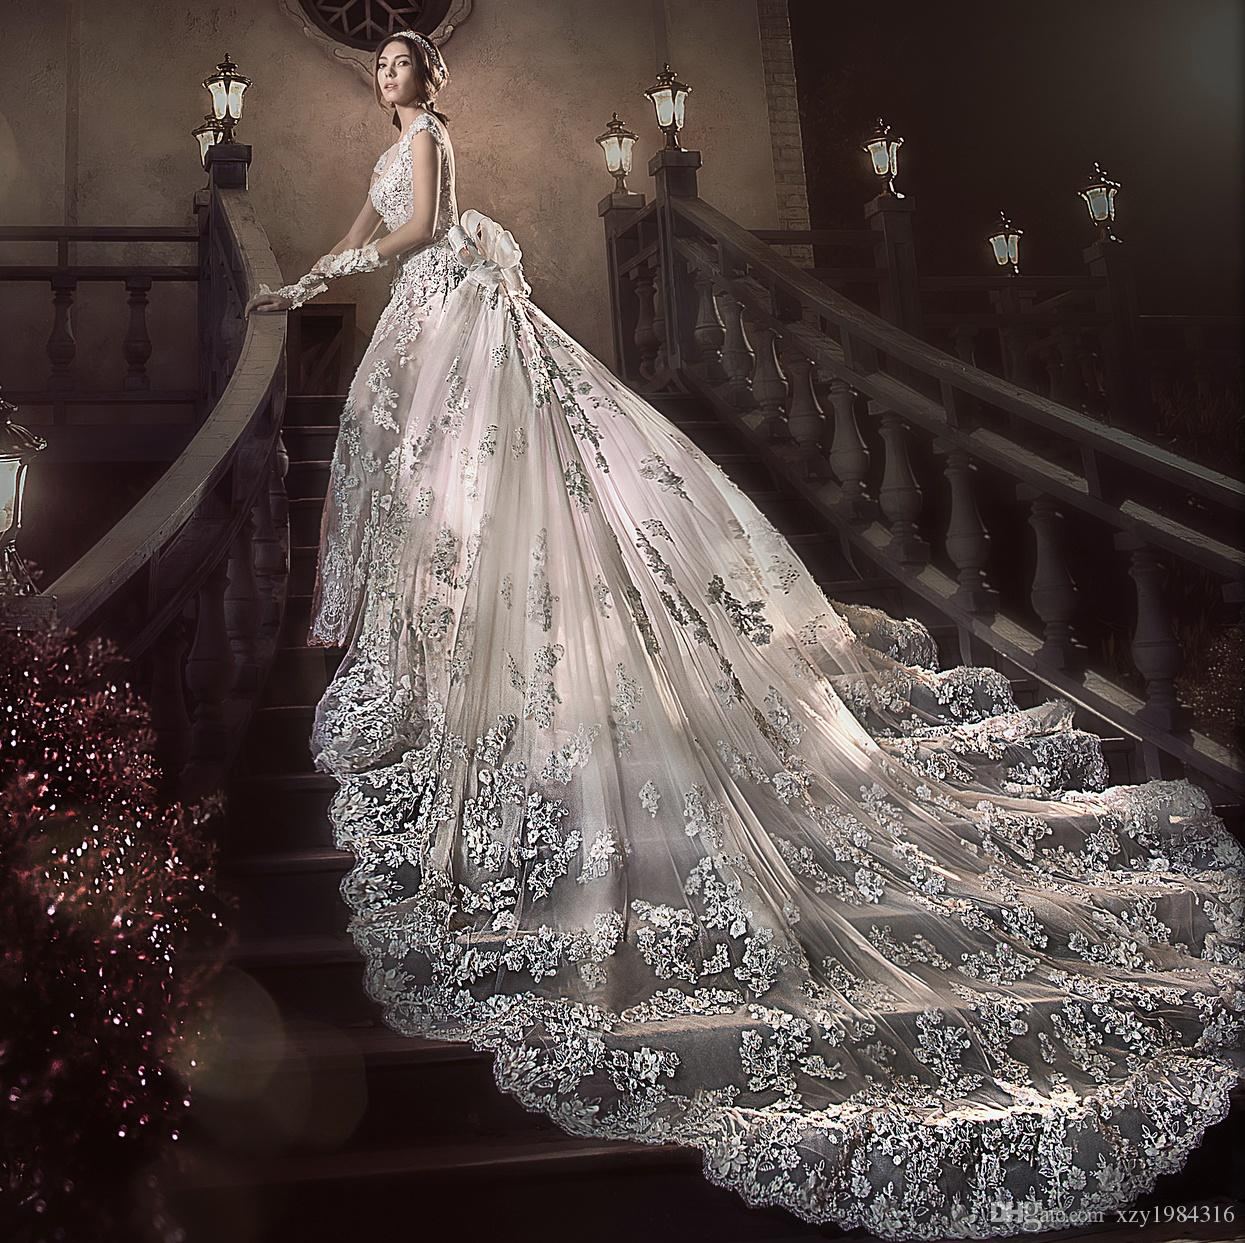 deb470835 2.5 Metros de Cauda Longa Vestido De Noiva Lindo Moda Destacável Trem  Vestido De Casamento De Praia de Luxo Cristal Frisado Applique Sereia  Vestido De ...